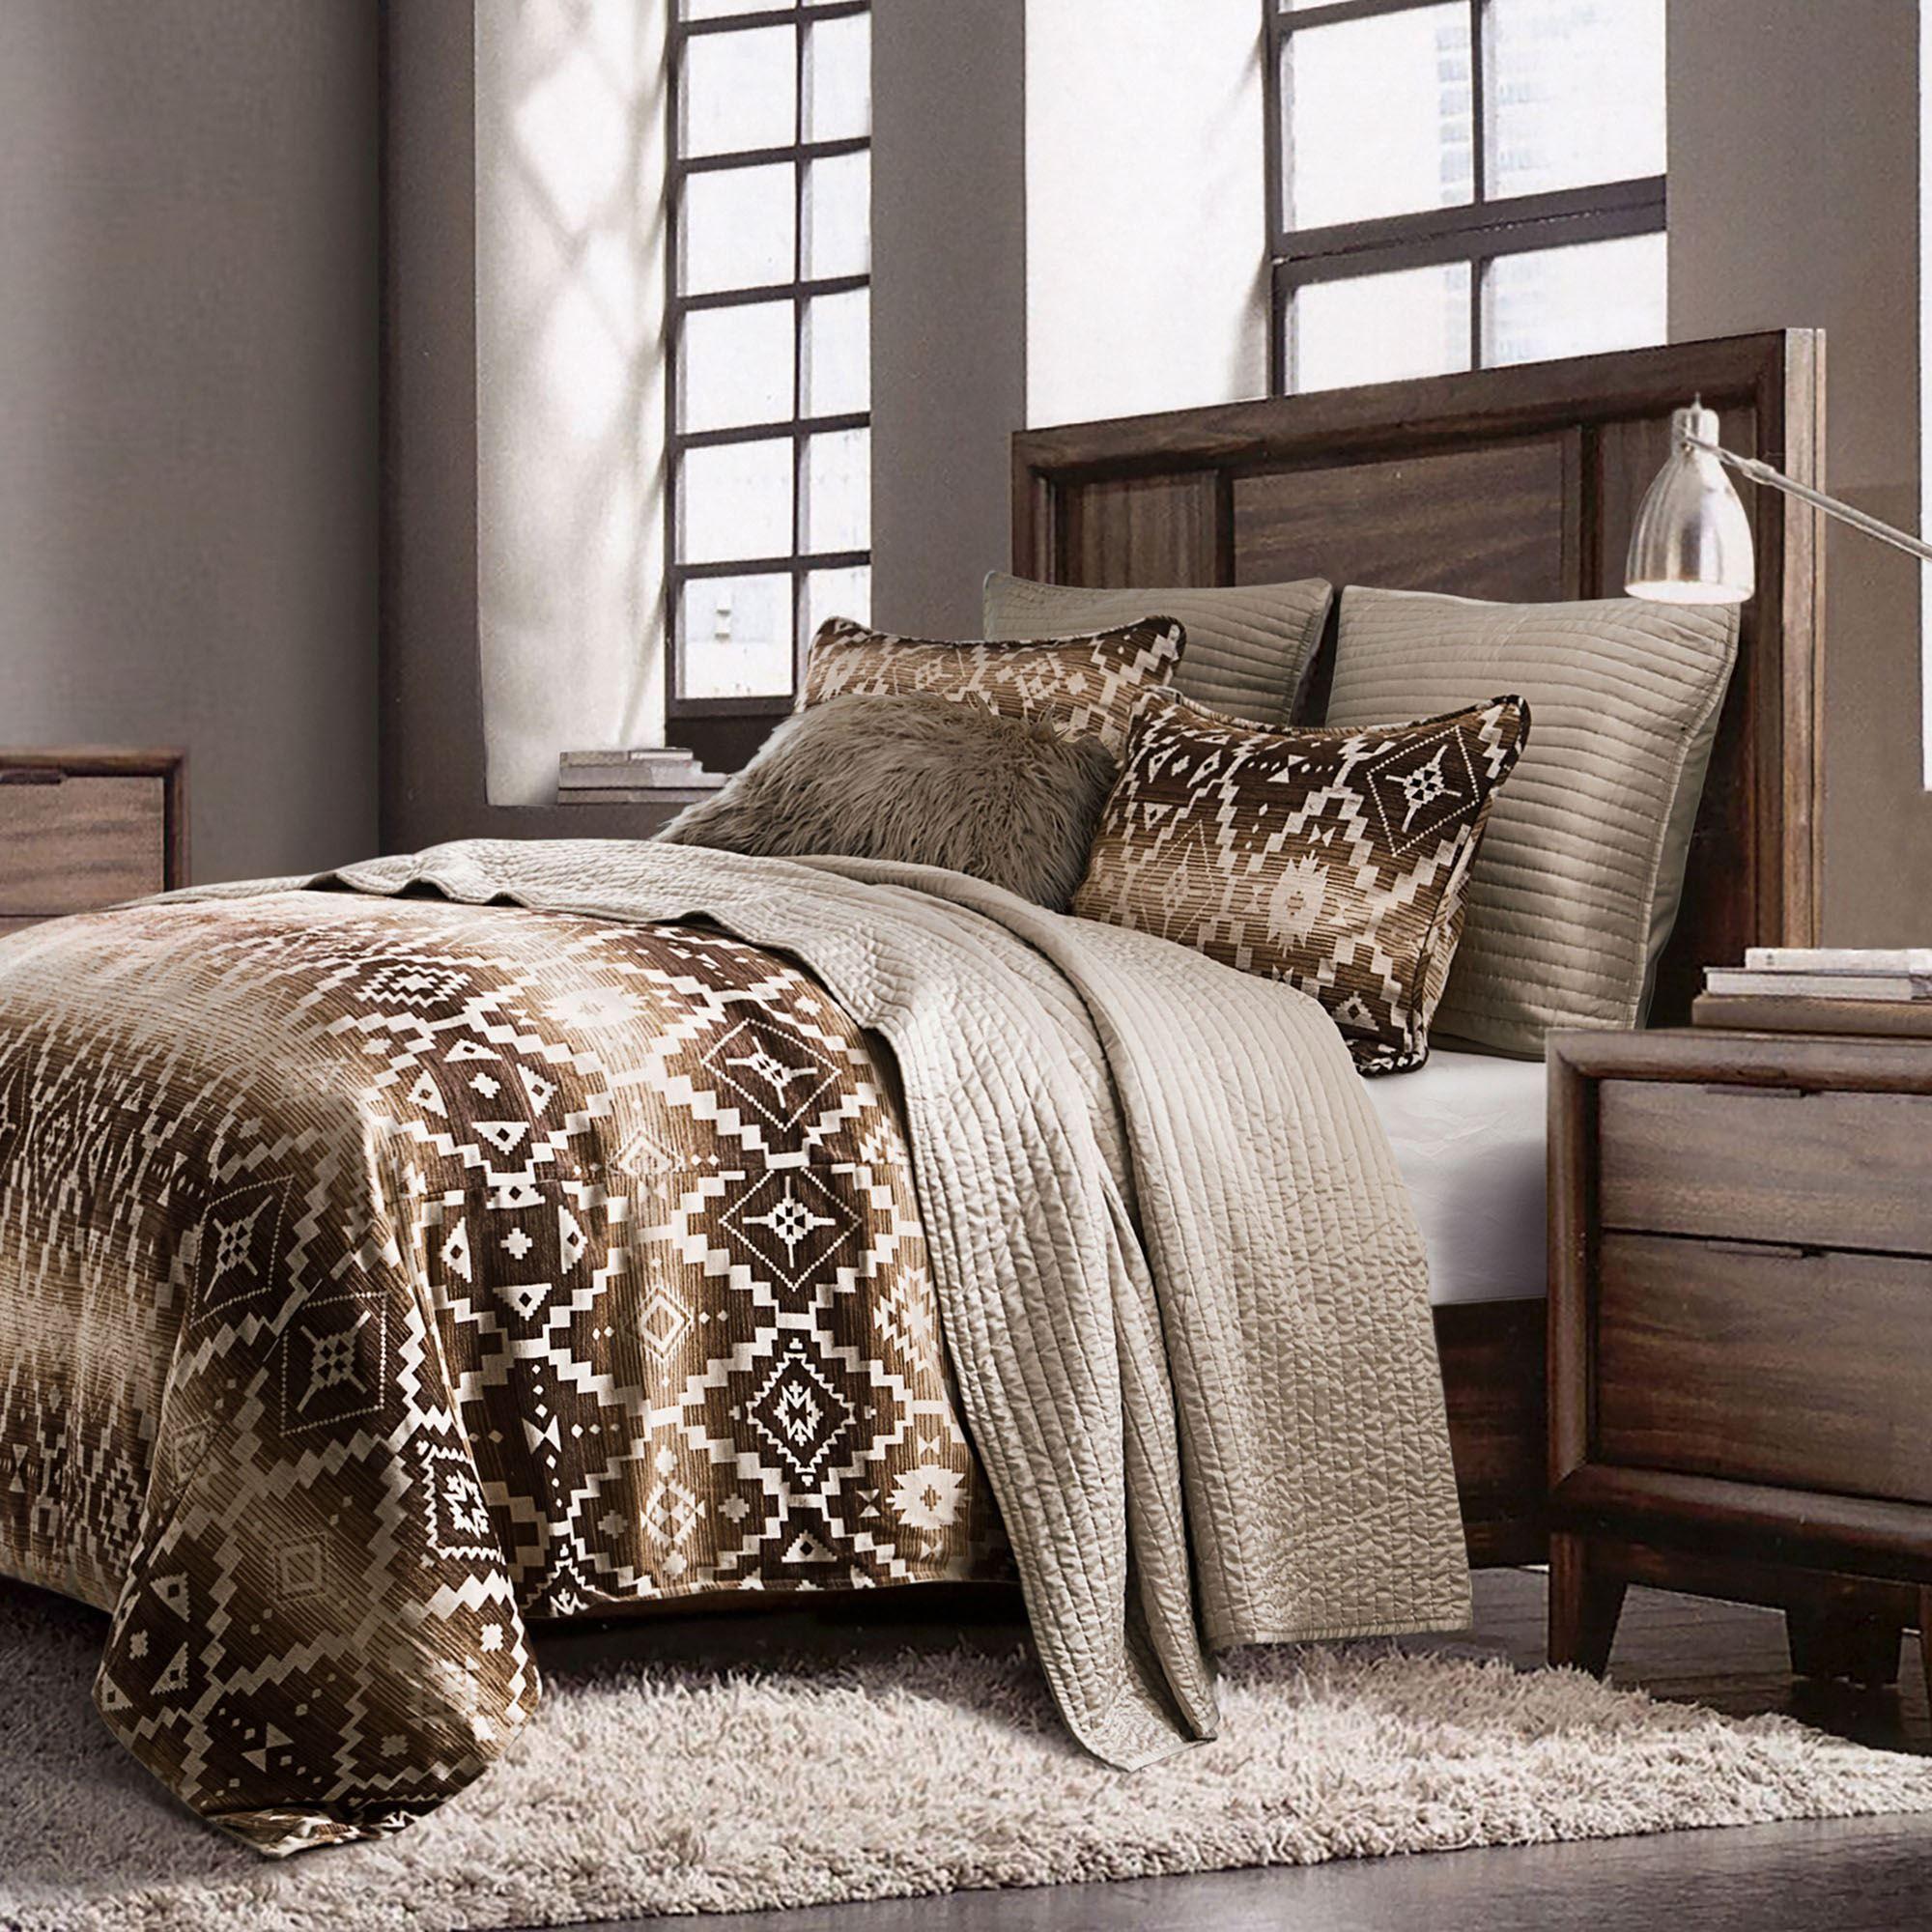 Chalet Ombre Rustic Mini Comforter Set Bedding